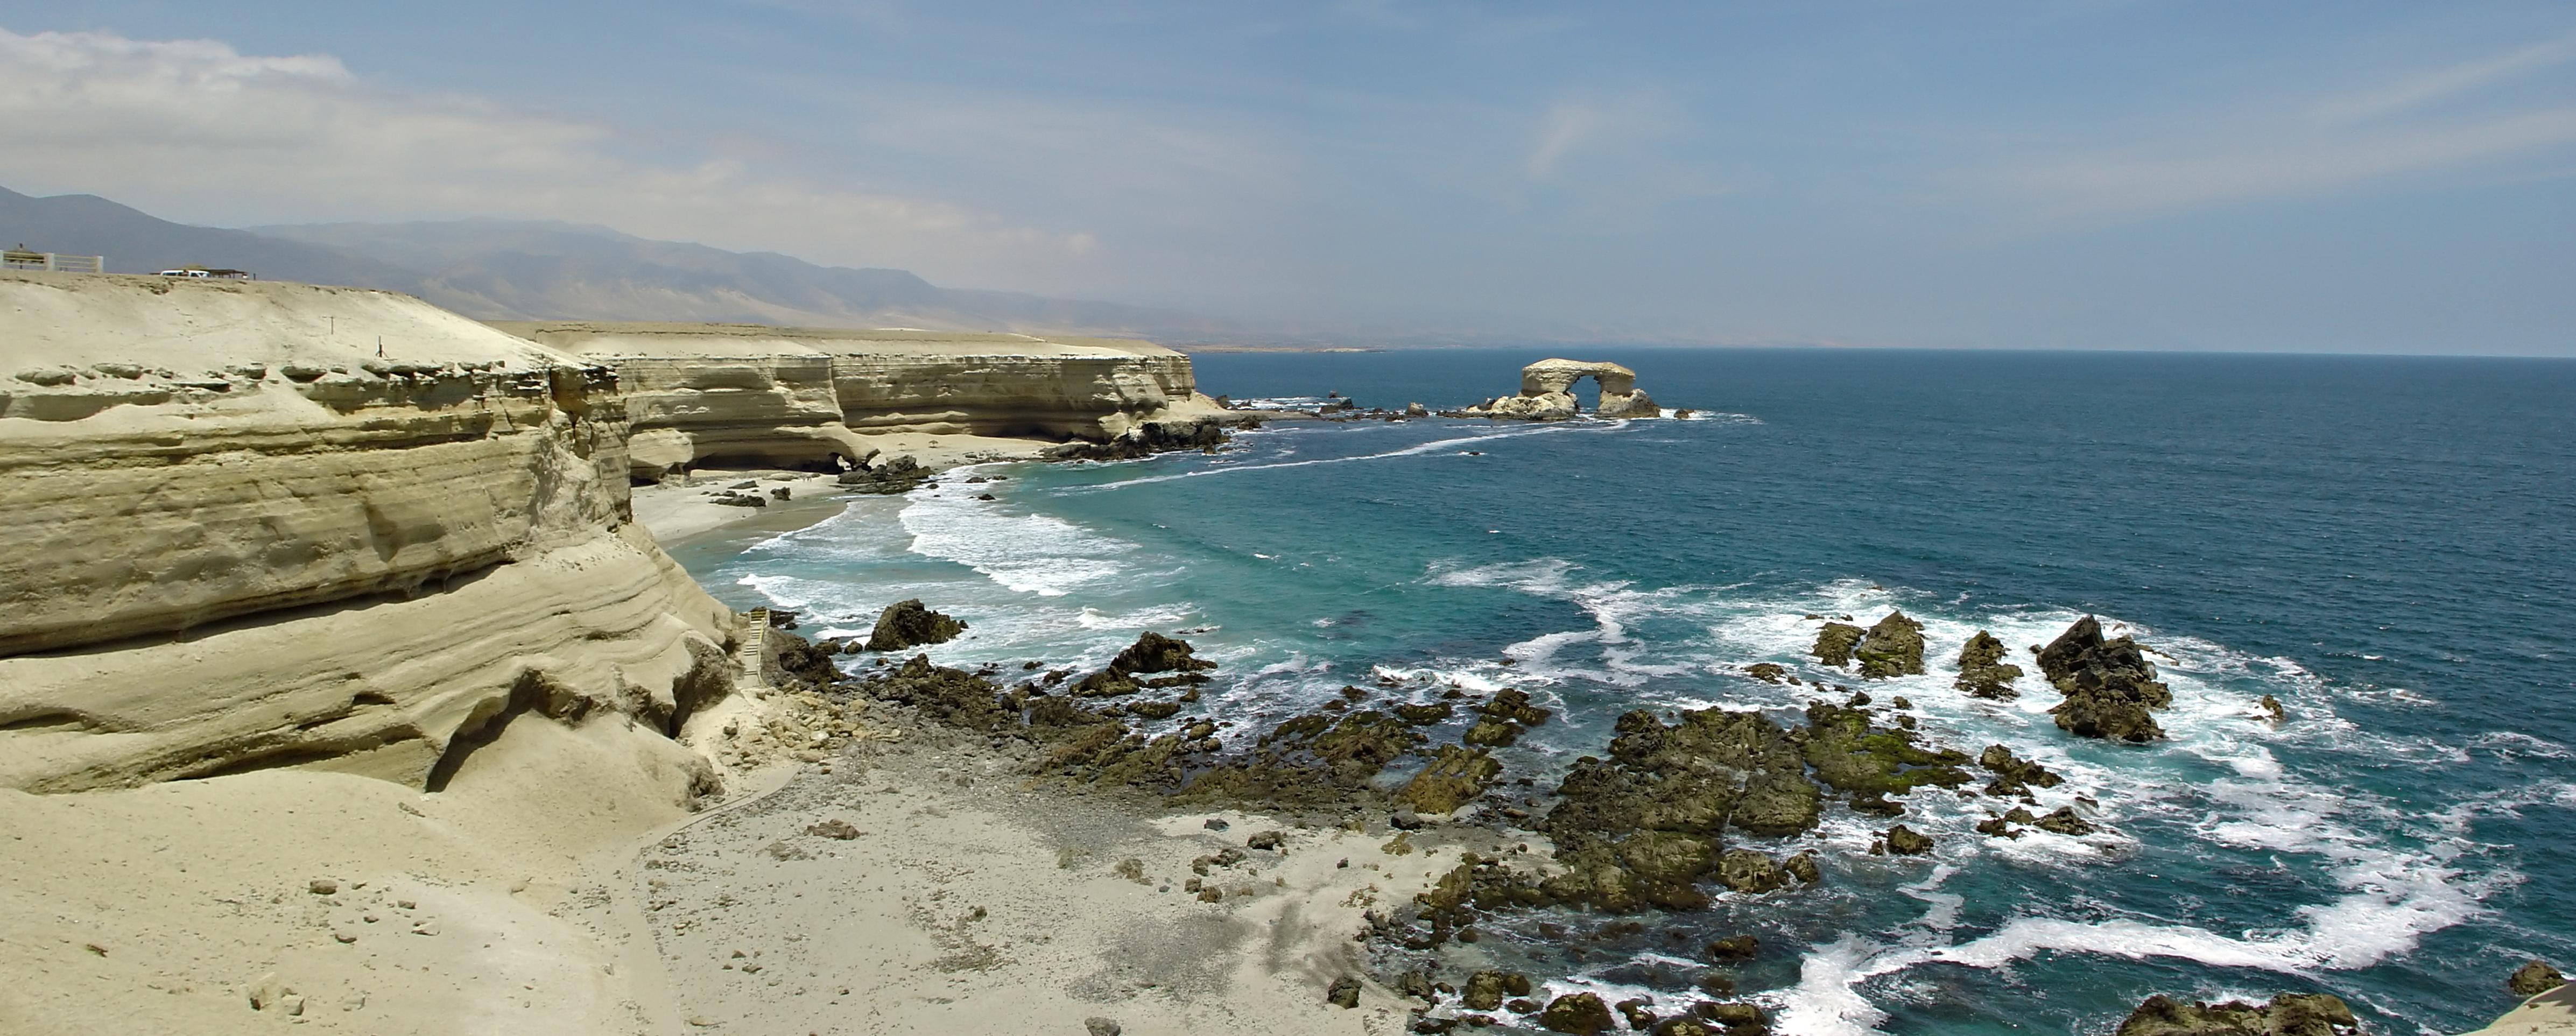 Antofagasta La portada